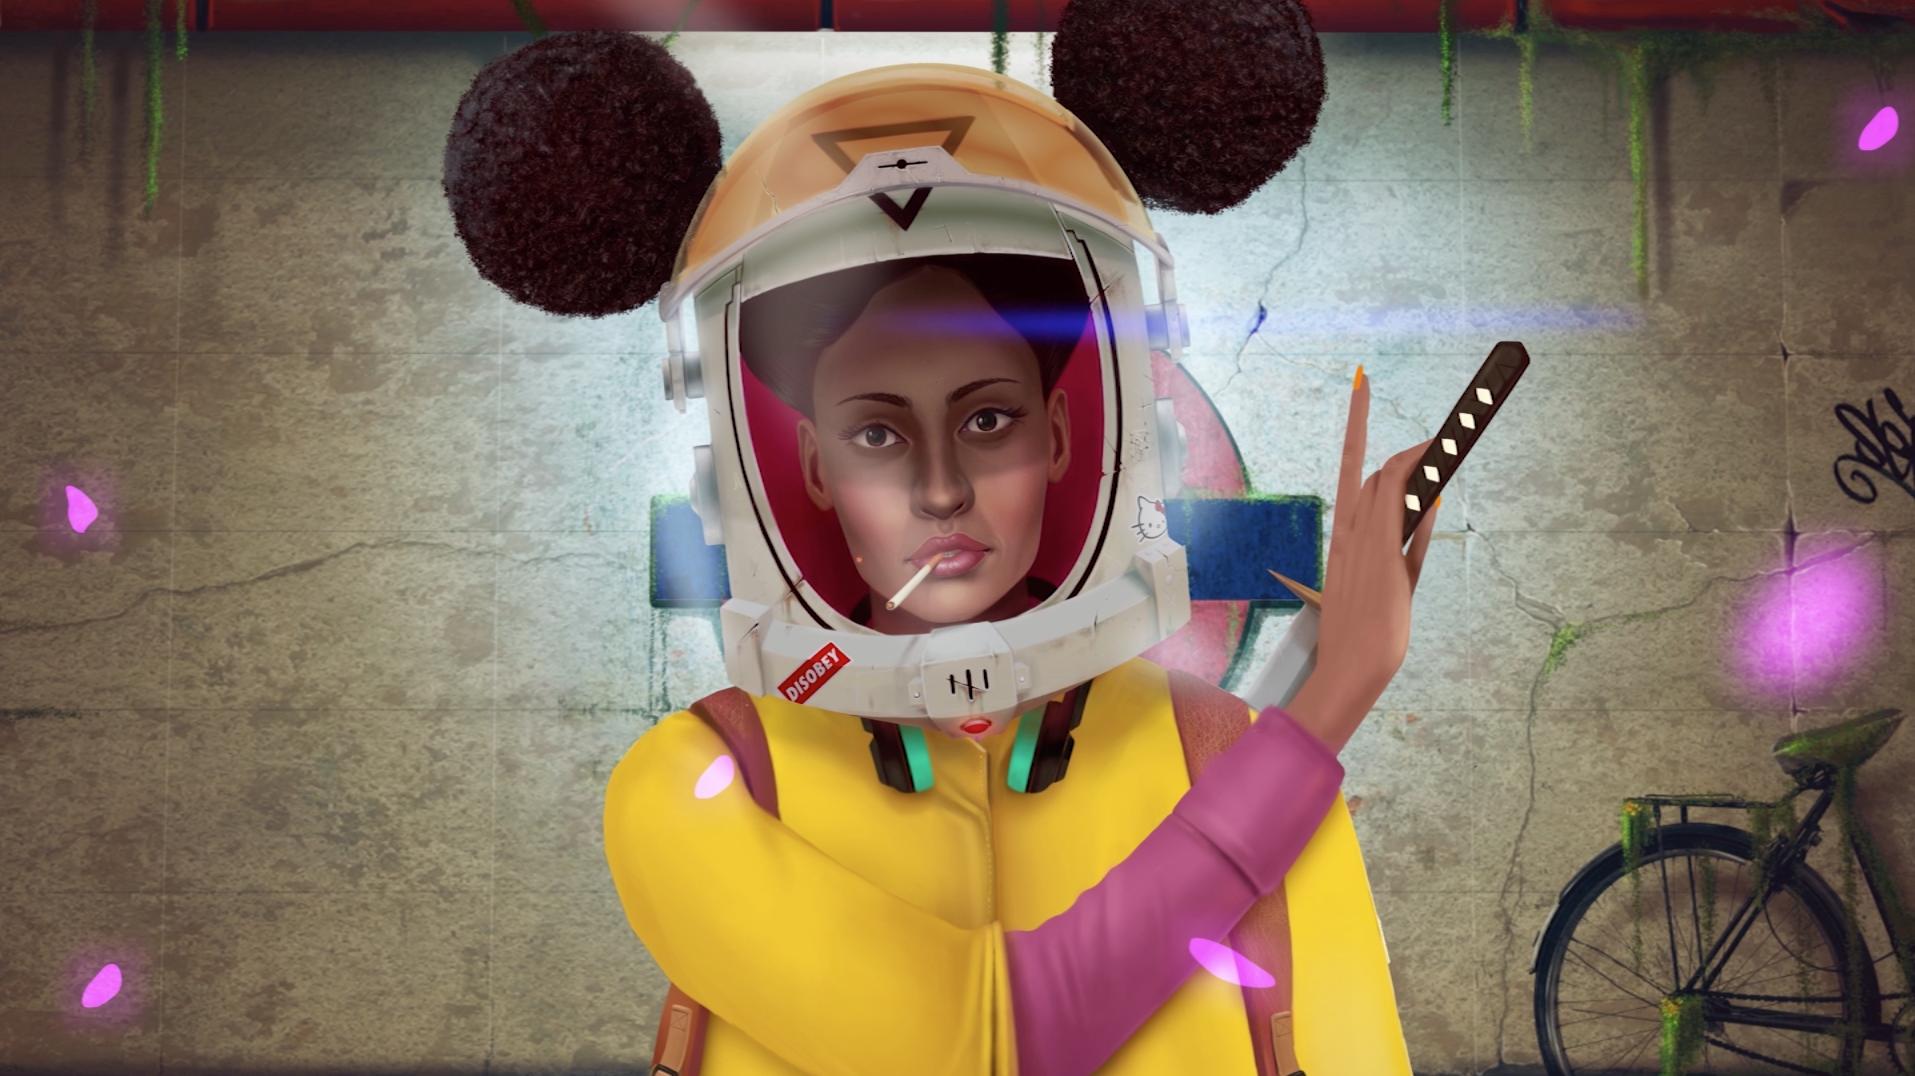 Afronaut the astronaut samurai